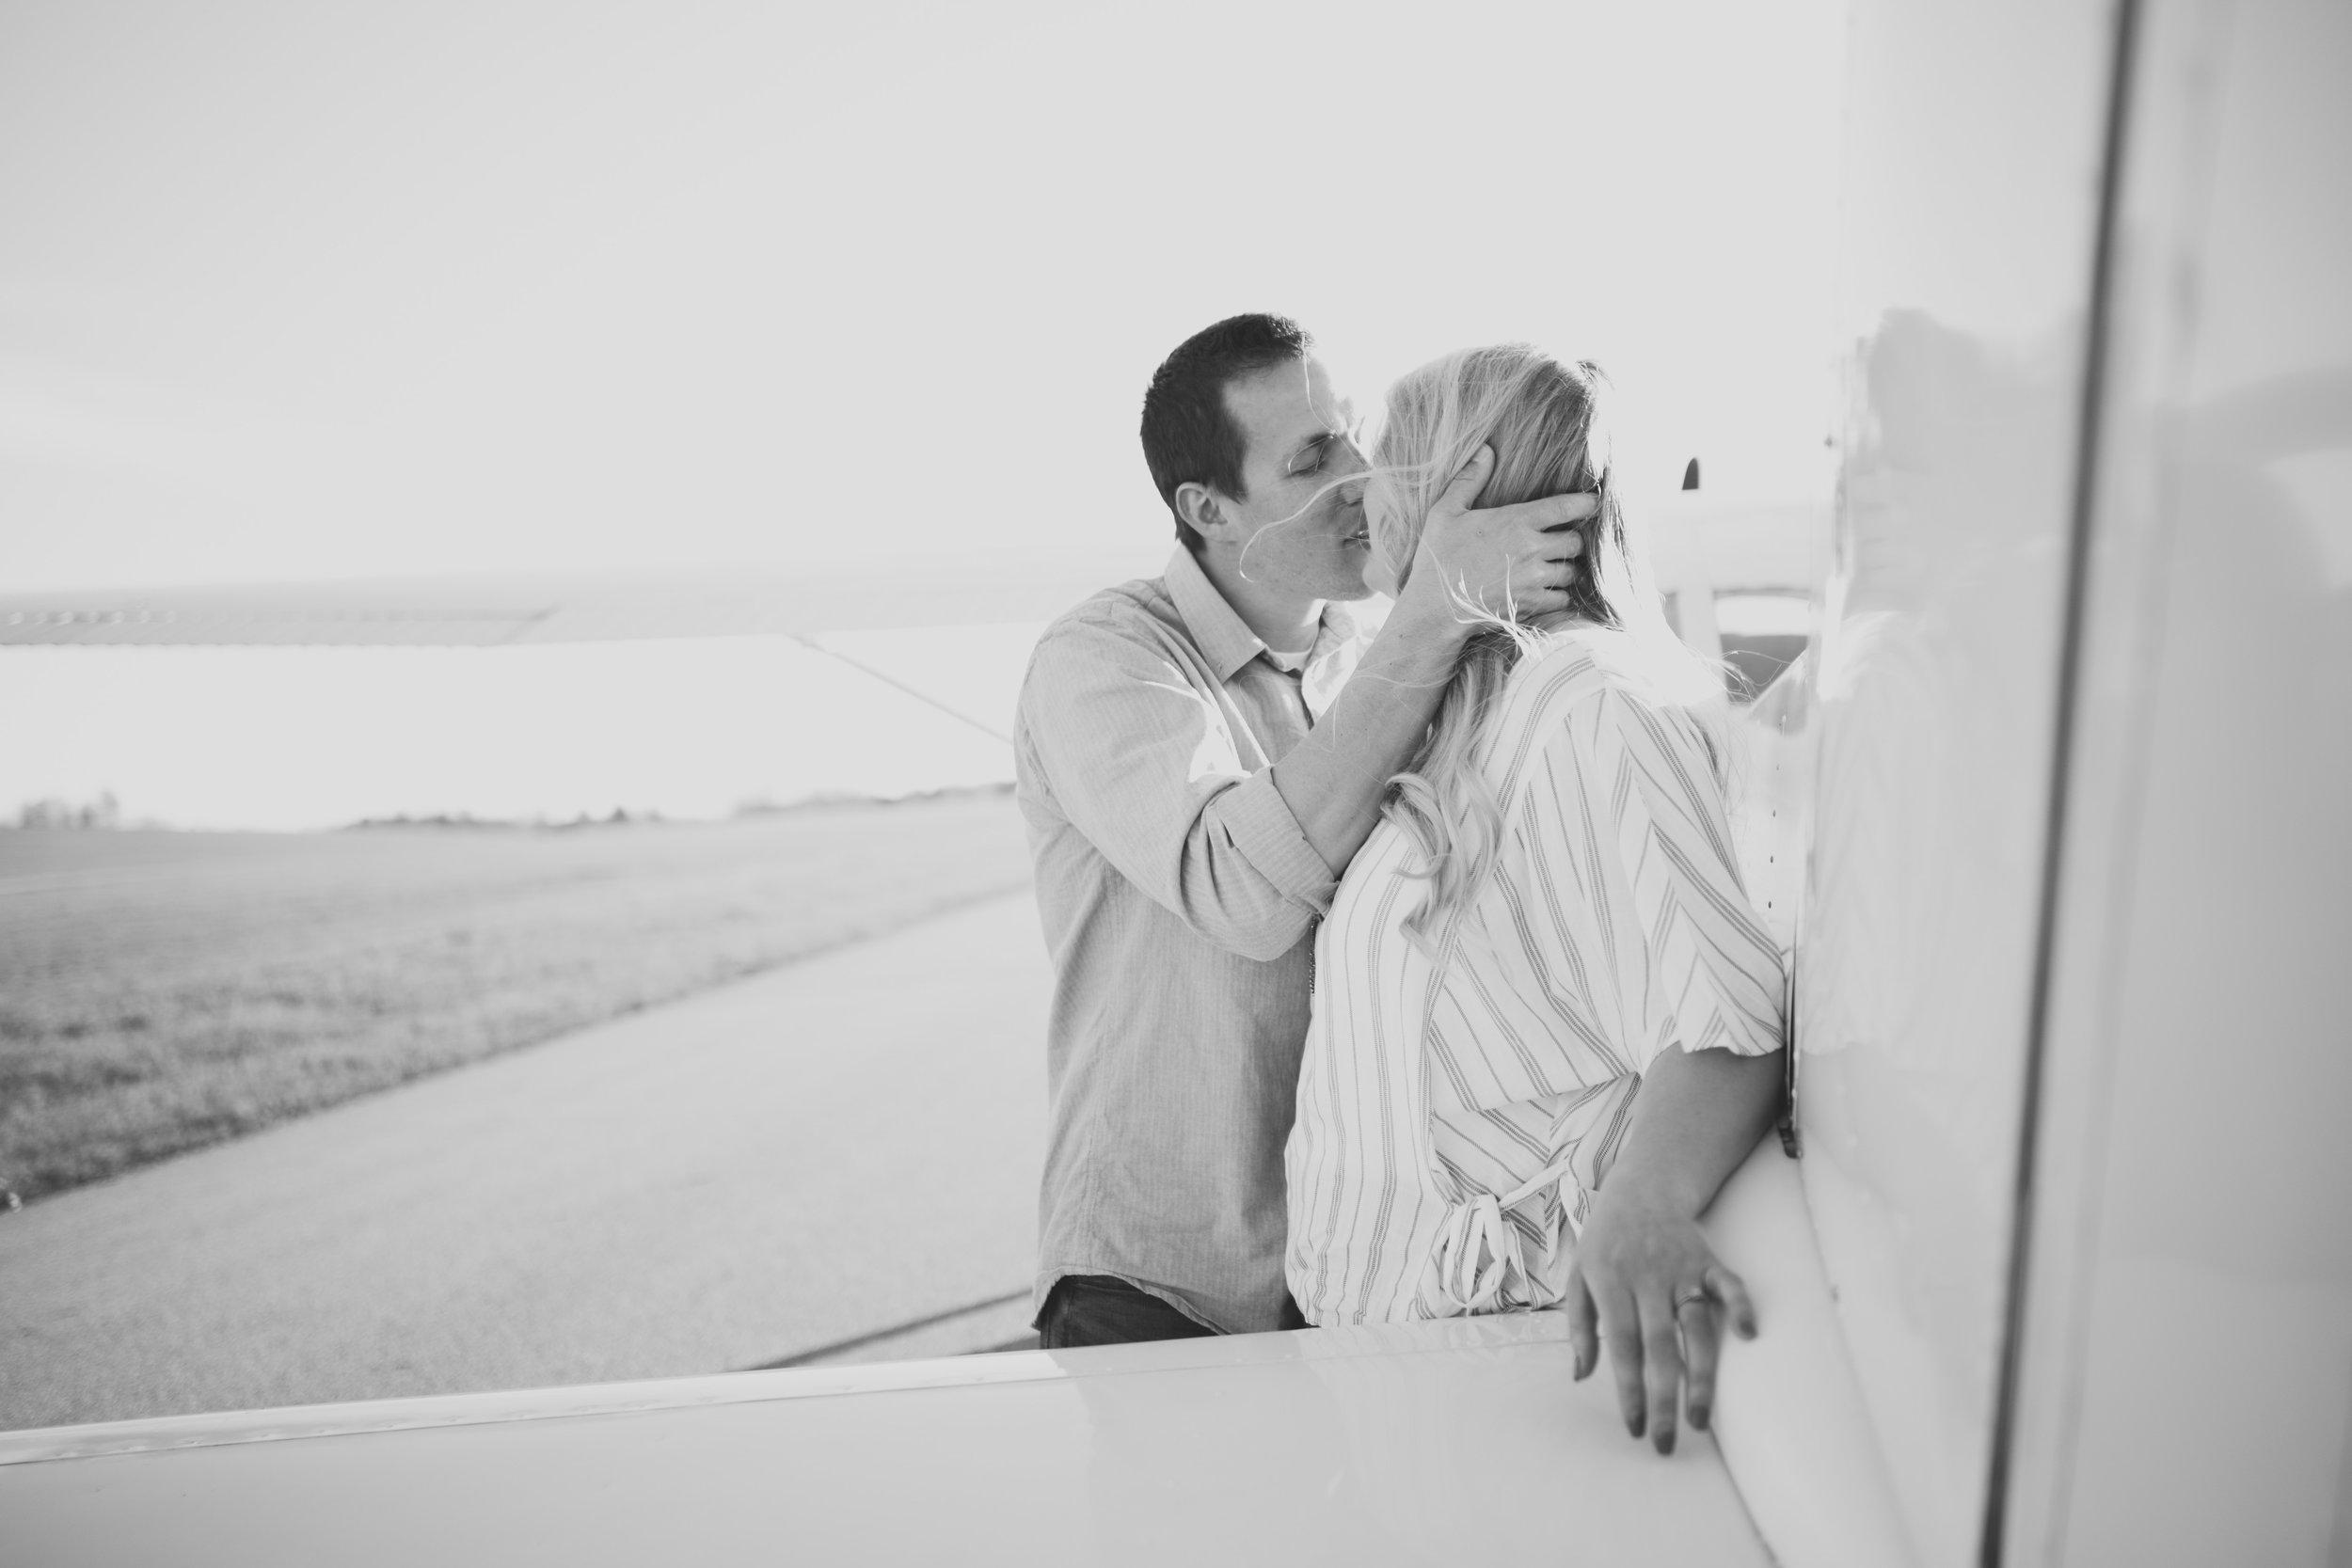 Grand Rapids Photographer - J Darling Photo - jessica darling - grand rapids wedding photographer - sparta airport - sparta michigan - jasmine and jeff engaged 021.jpg